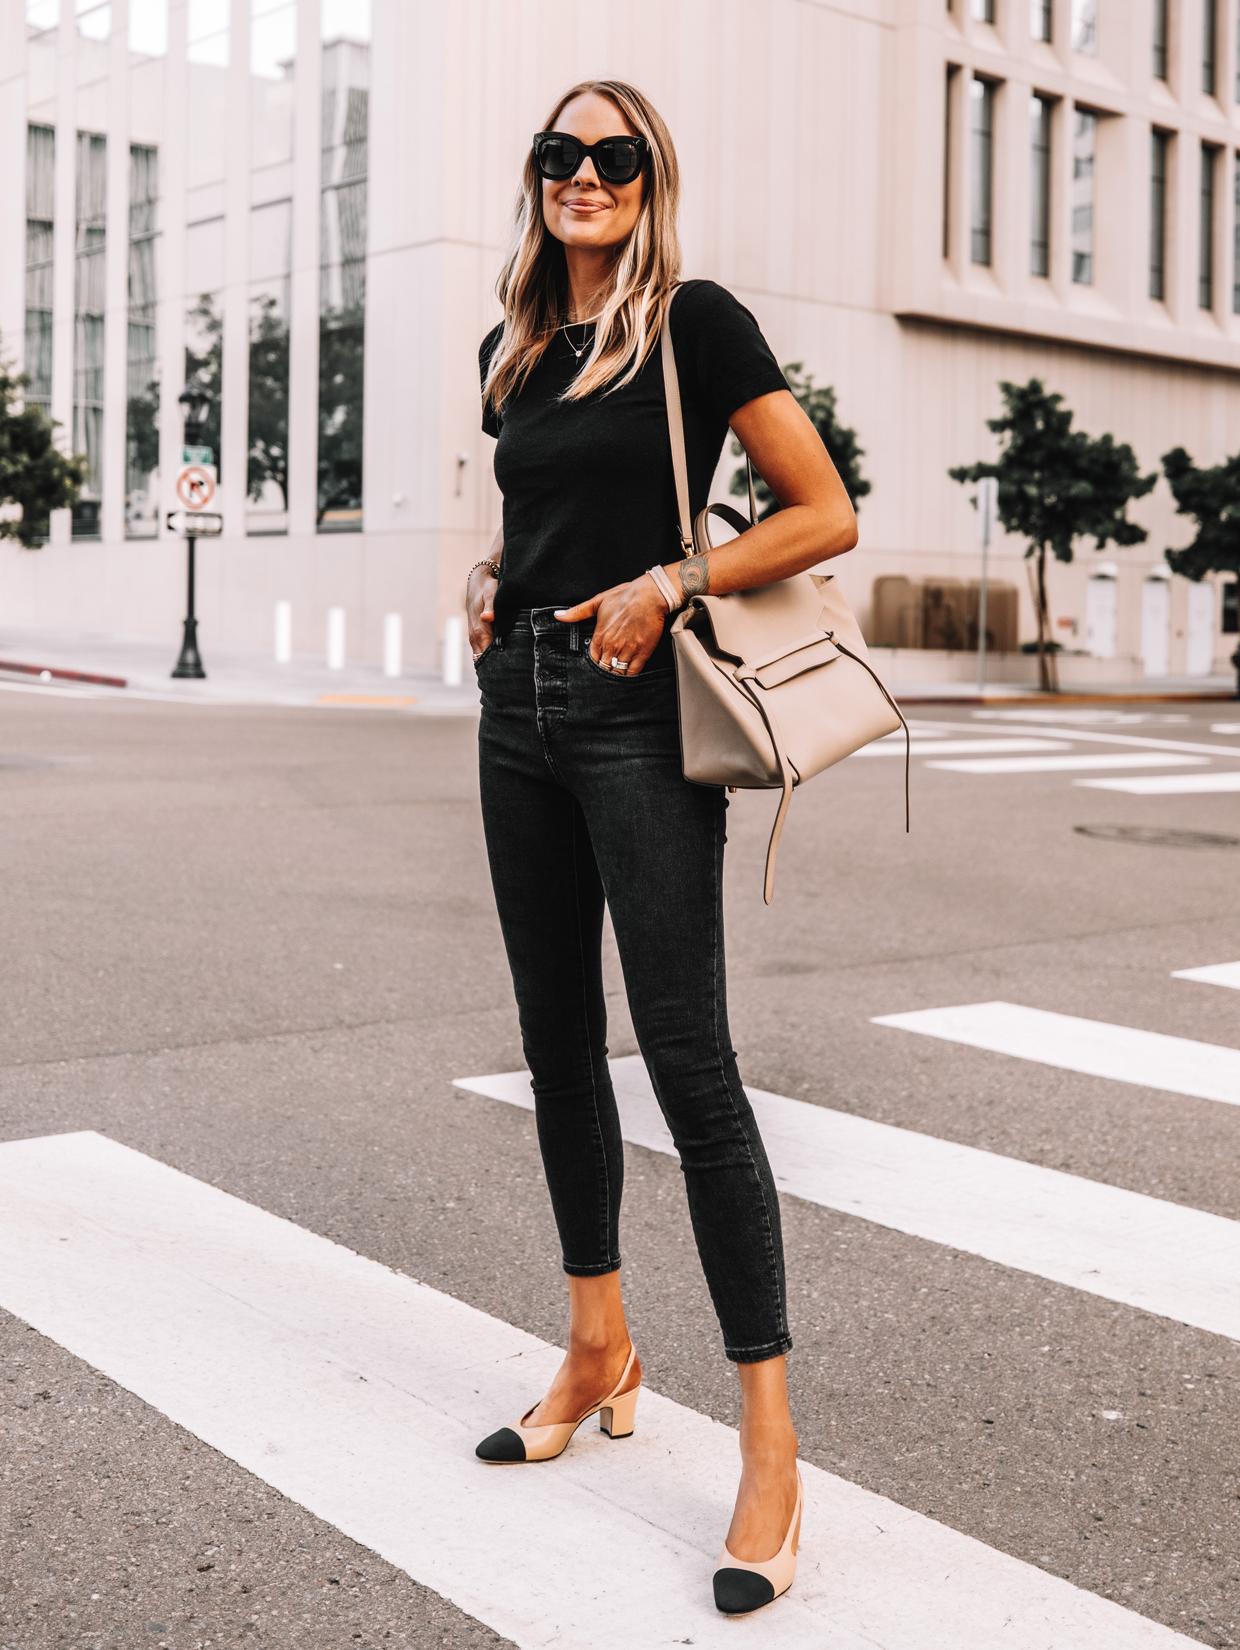 My Honest Review Of The Celine Mini Belt Bag Fashion Jackson